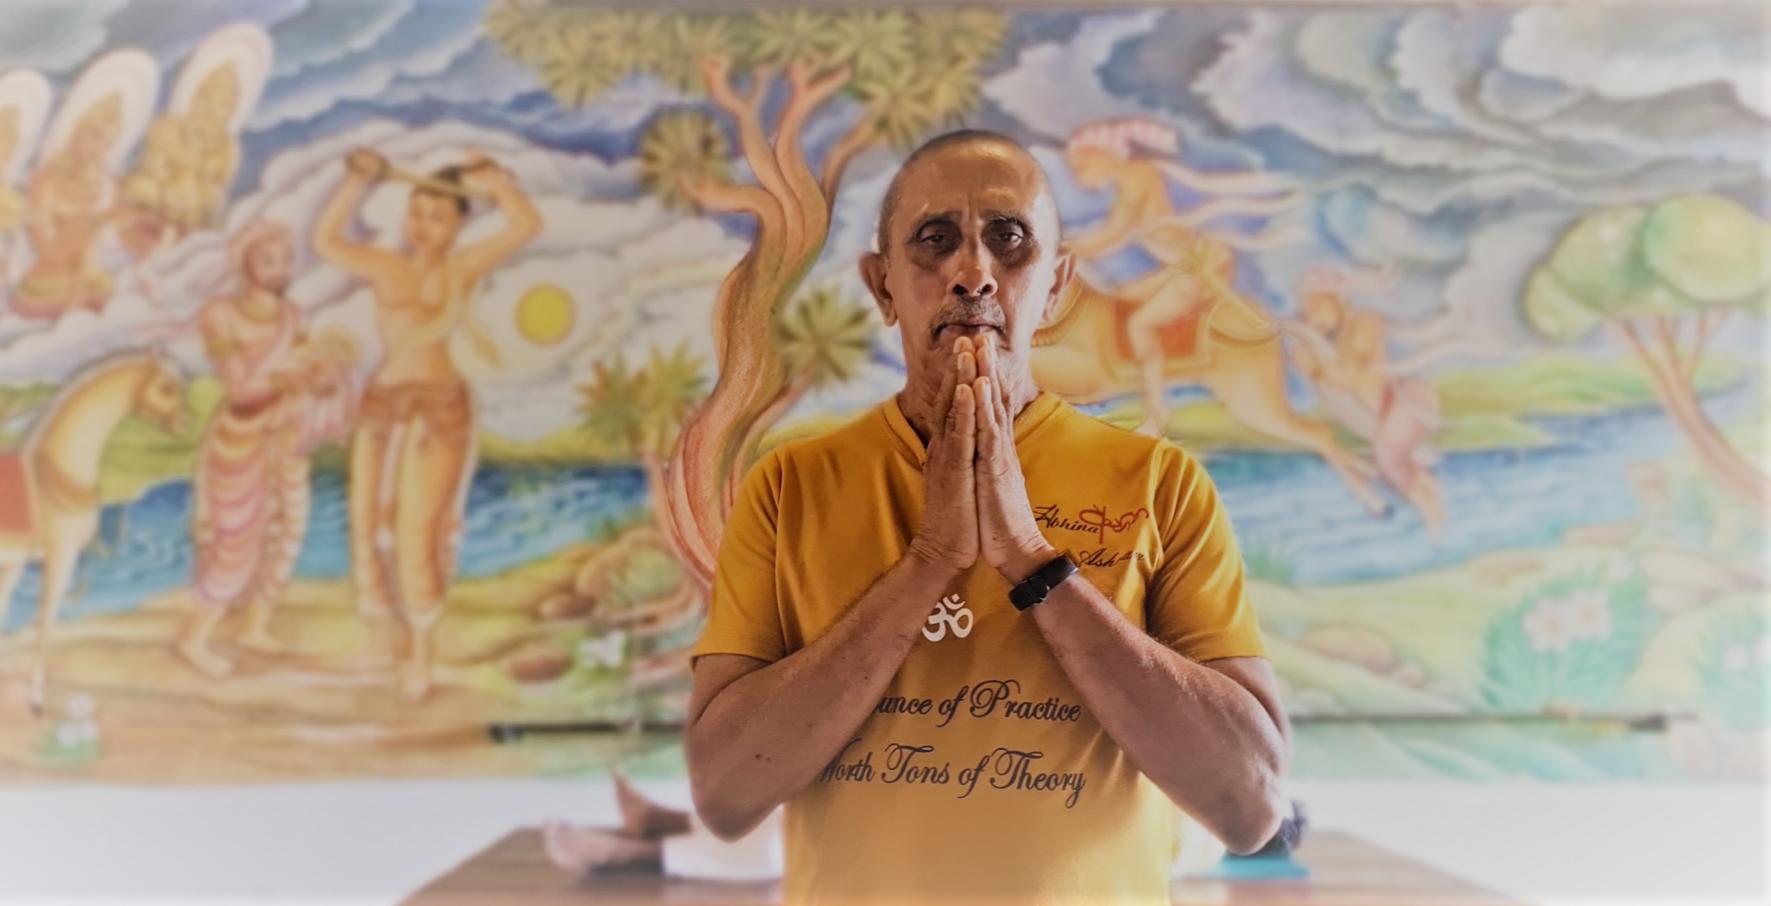 Introduction to Yoga Asana Class with Sivananda Yoga Instructor at Barberyn Ayurveda Resorts. Yoga Asana Class for Zoom Webinar during lockdown